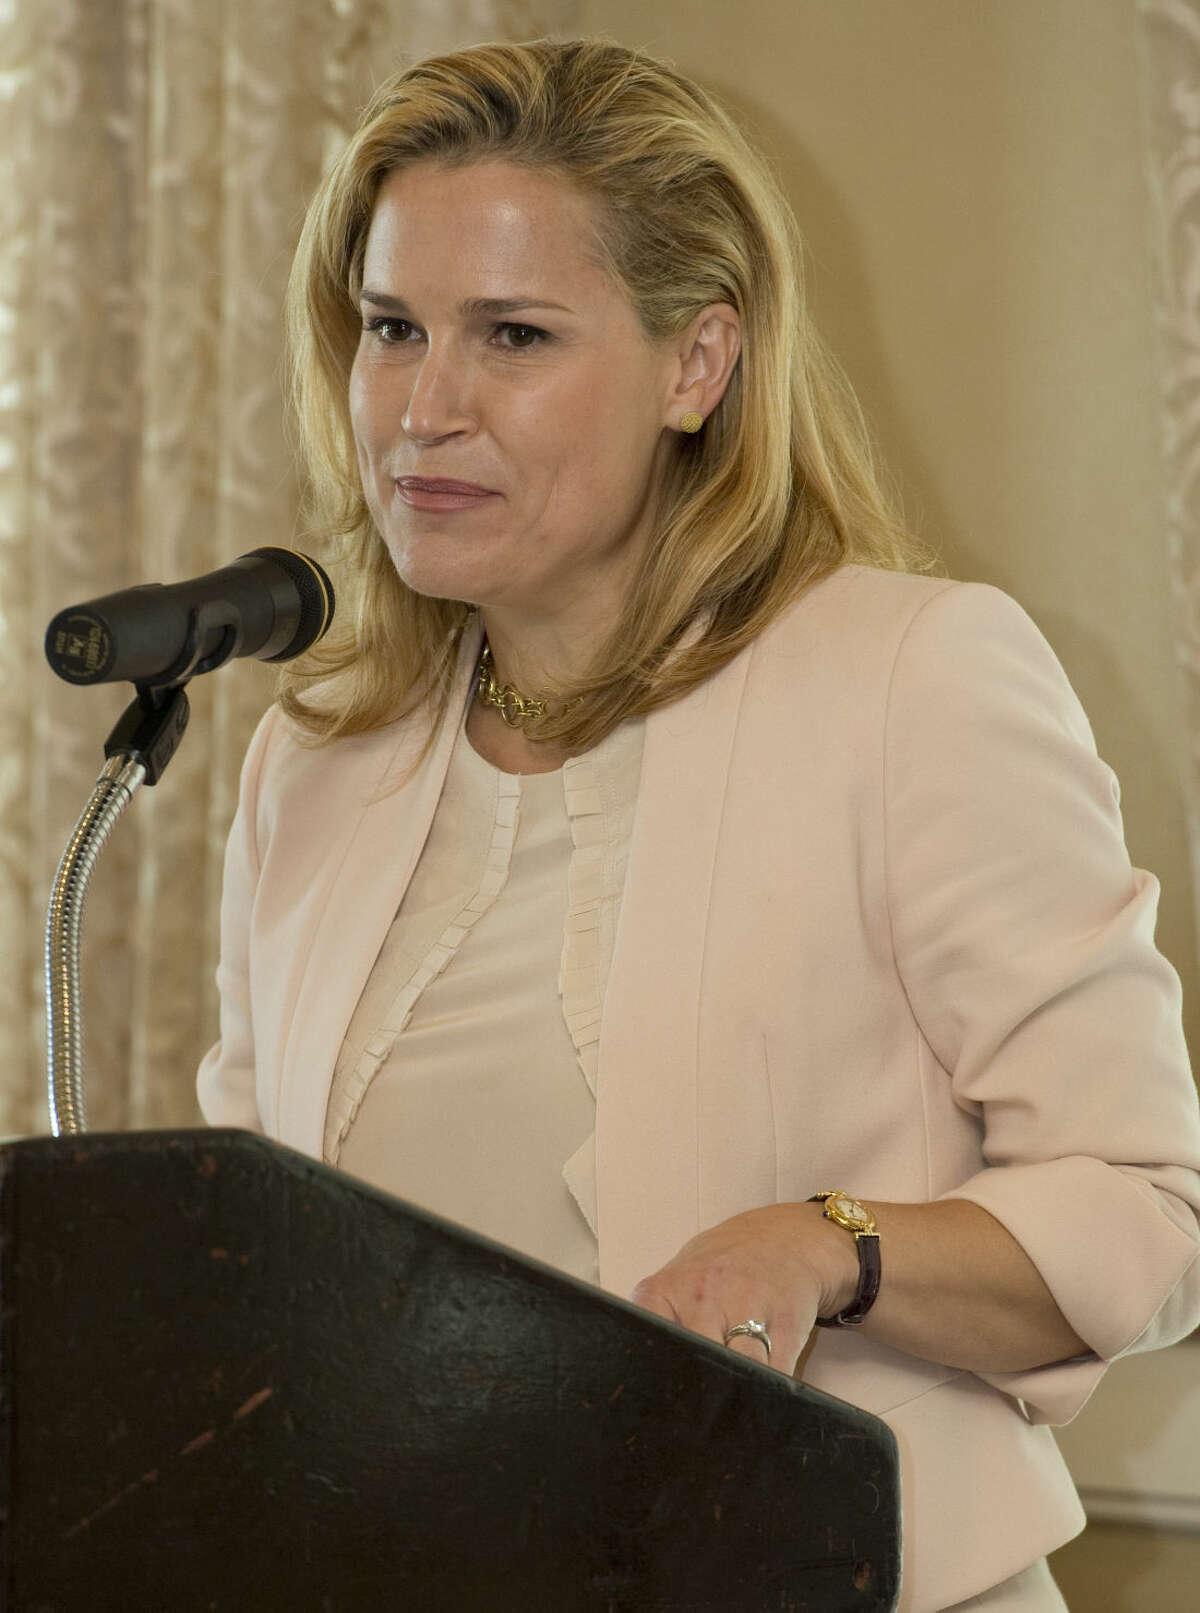 Heidi Cruz, wife of Presidential candidate Ted Cruz, speaks Wednesday 8-12-15 at the Midland County Republican Women's luncheon. Tim Fischer\Reporter-Telegram